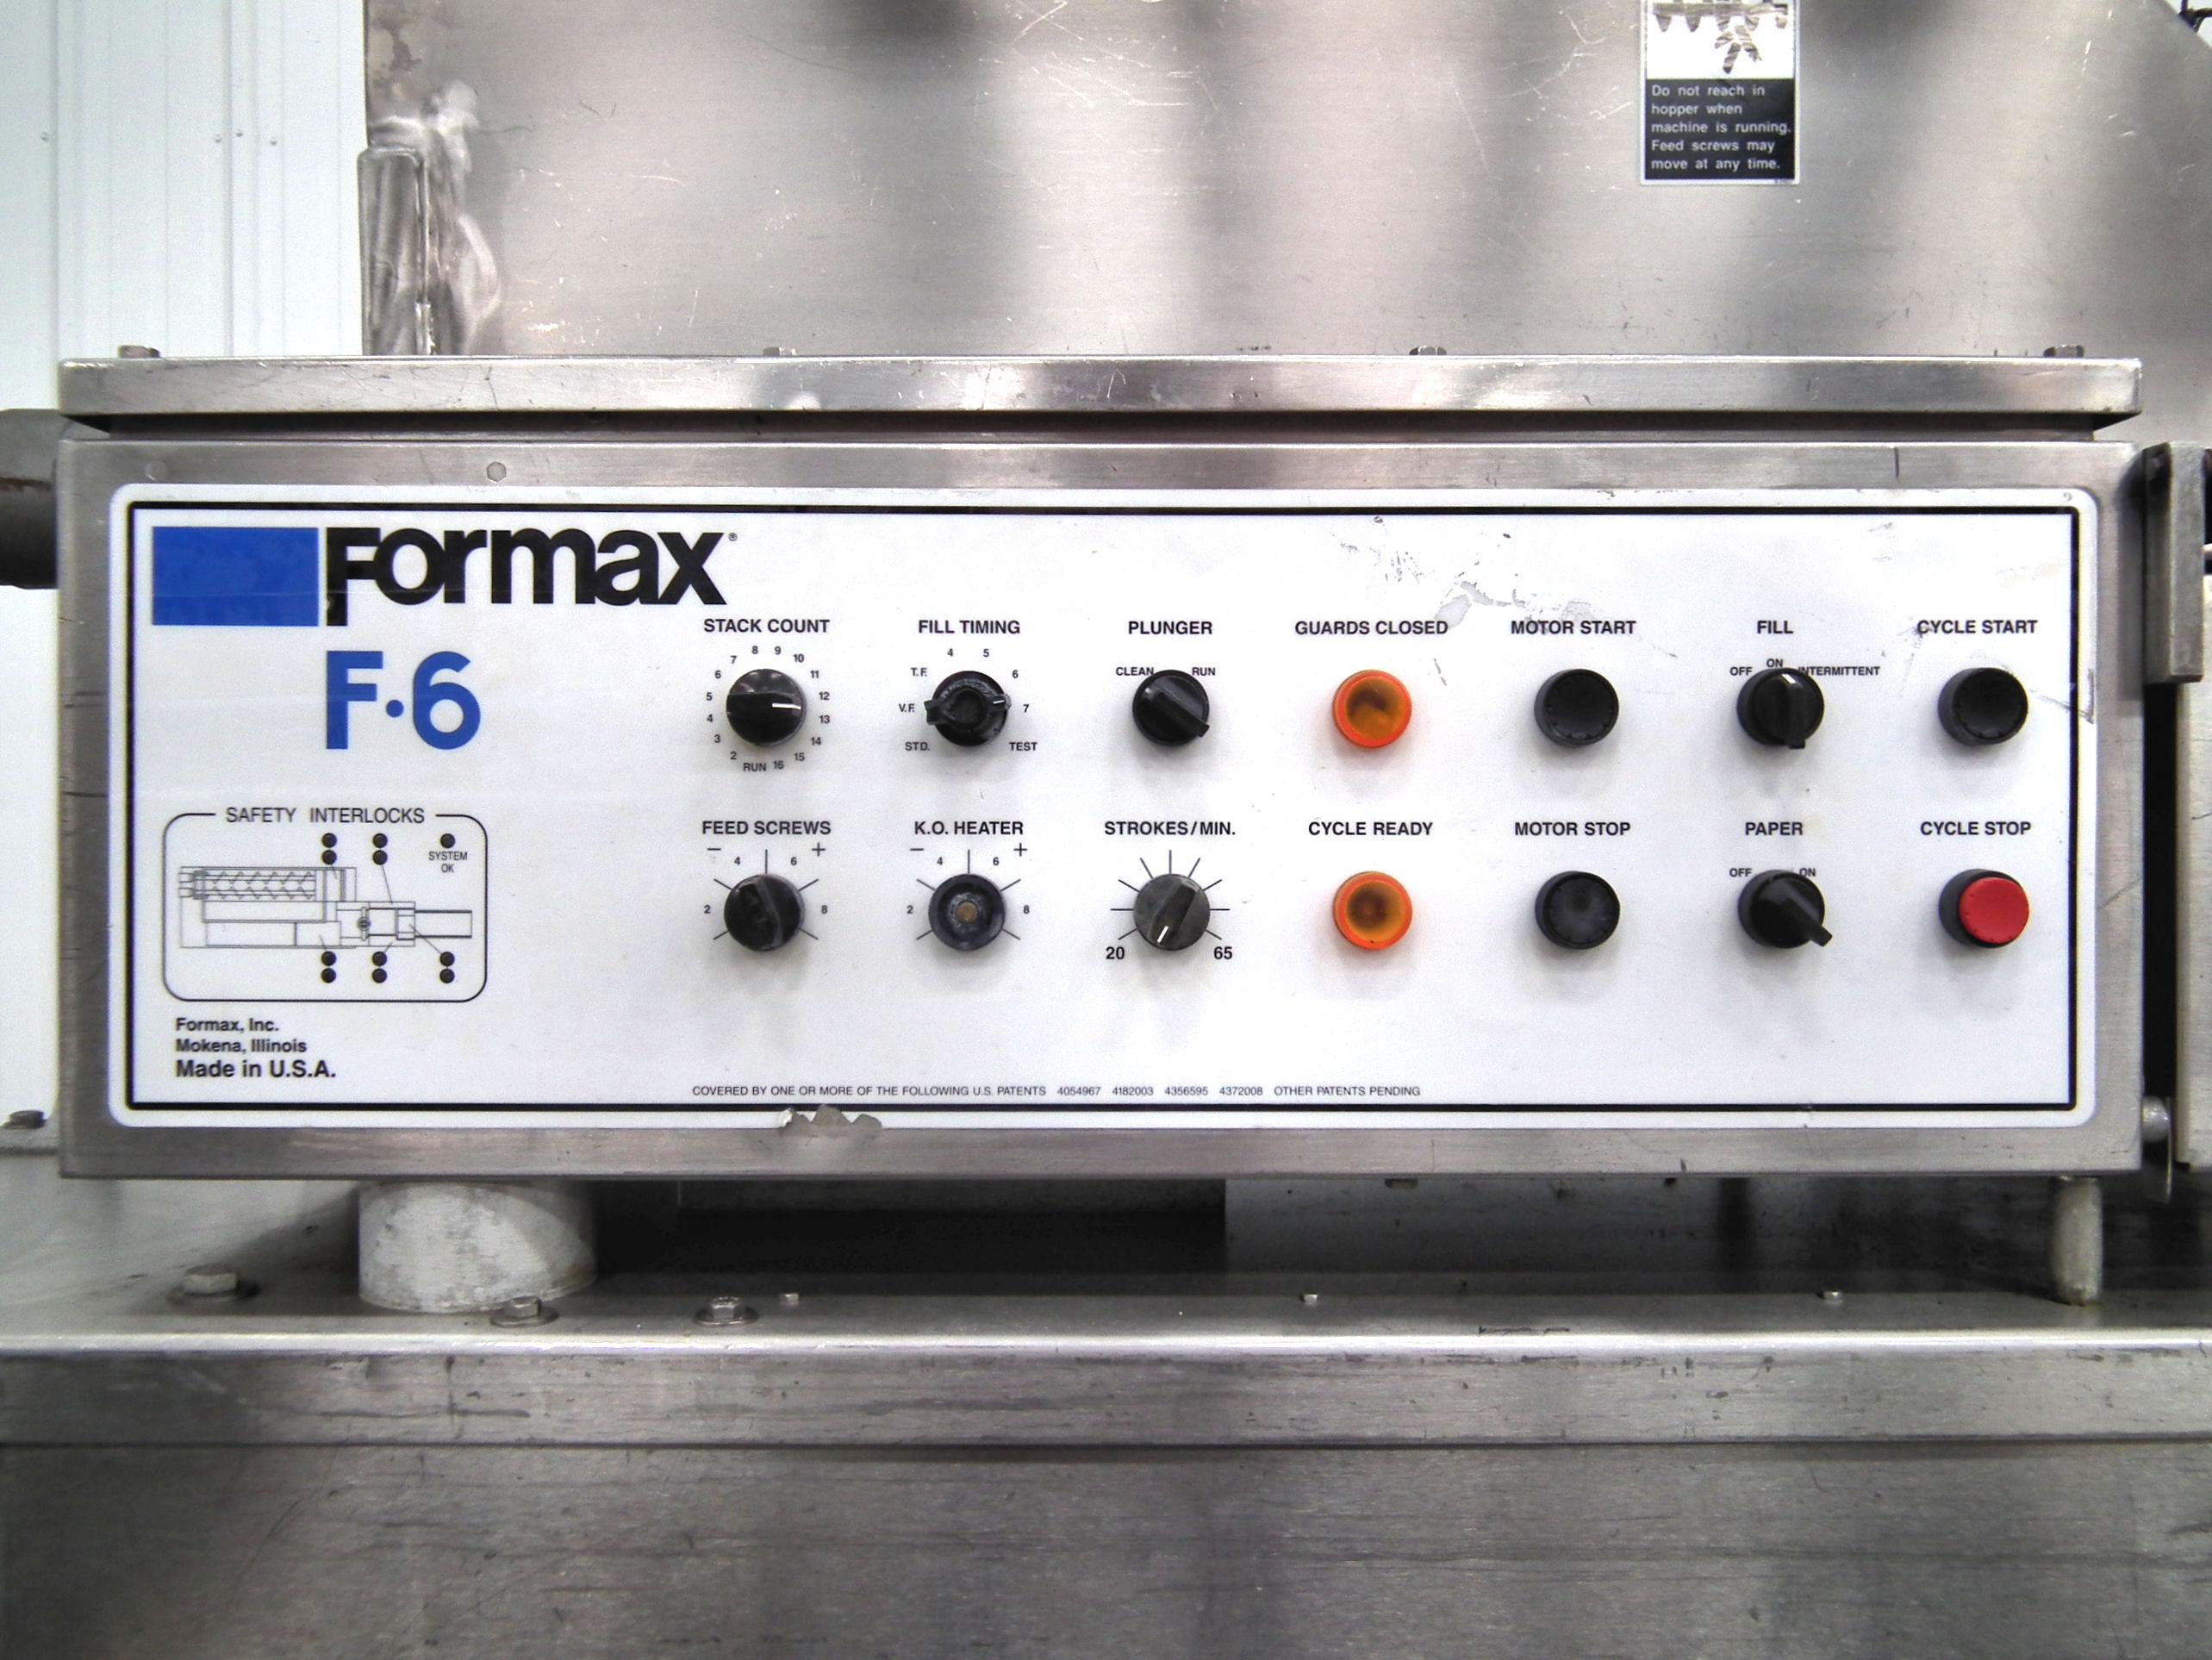 Formax PFM-6 Patty Former Vac-Tear Paper System A1952 - Image 5 of 15